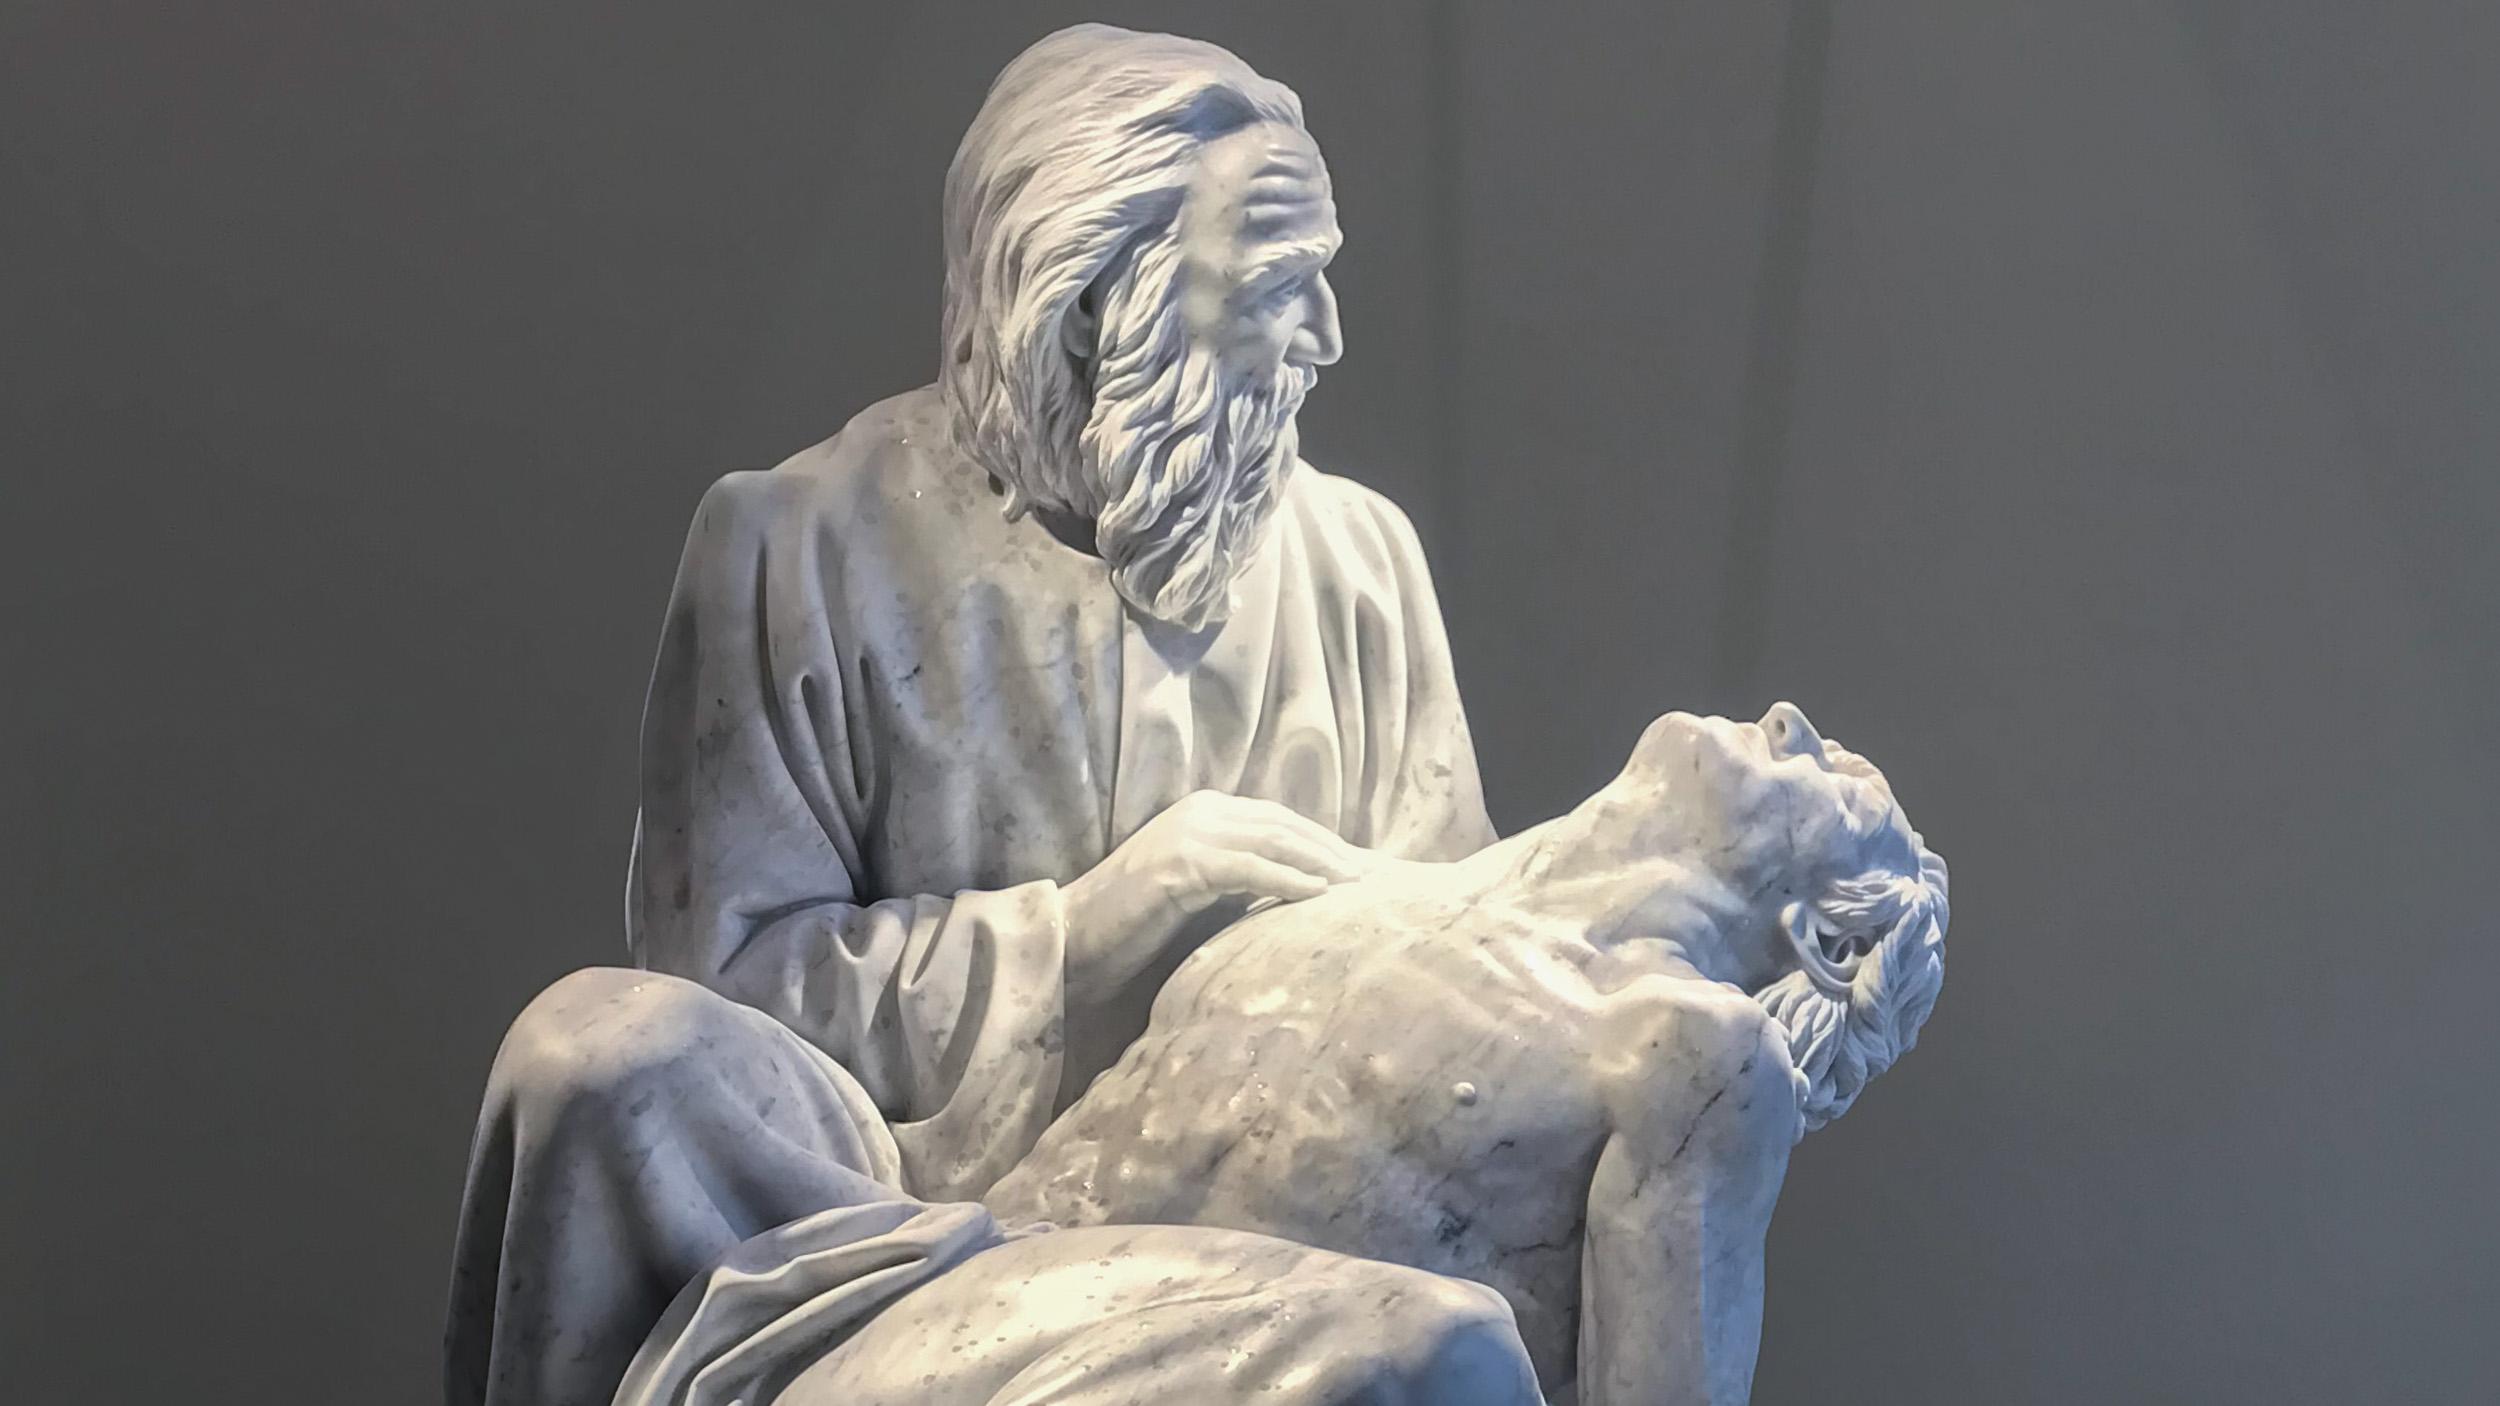 Official unveiling of Good Samaritan Sculpture at Saint Luke's Marion Bloch Neuro Science Building